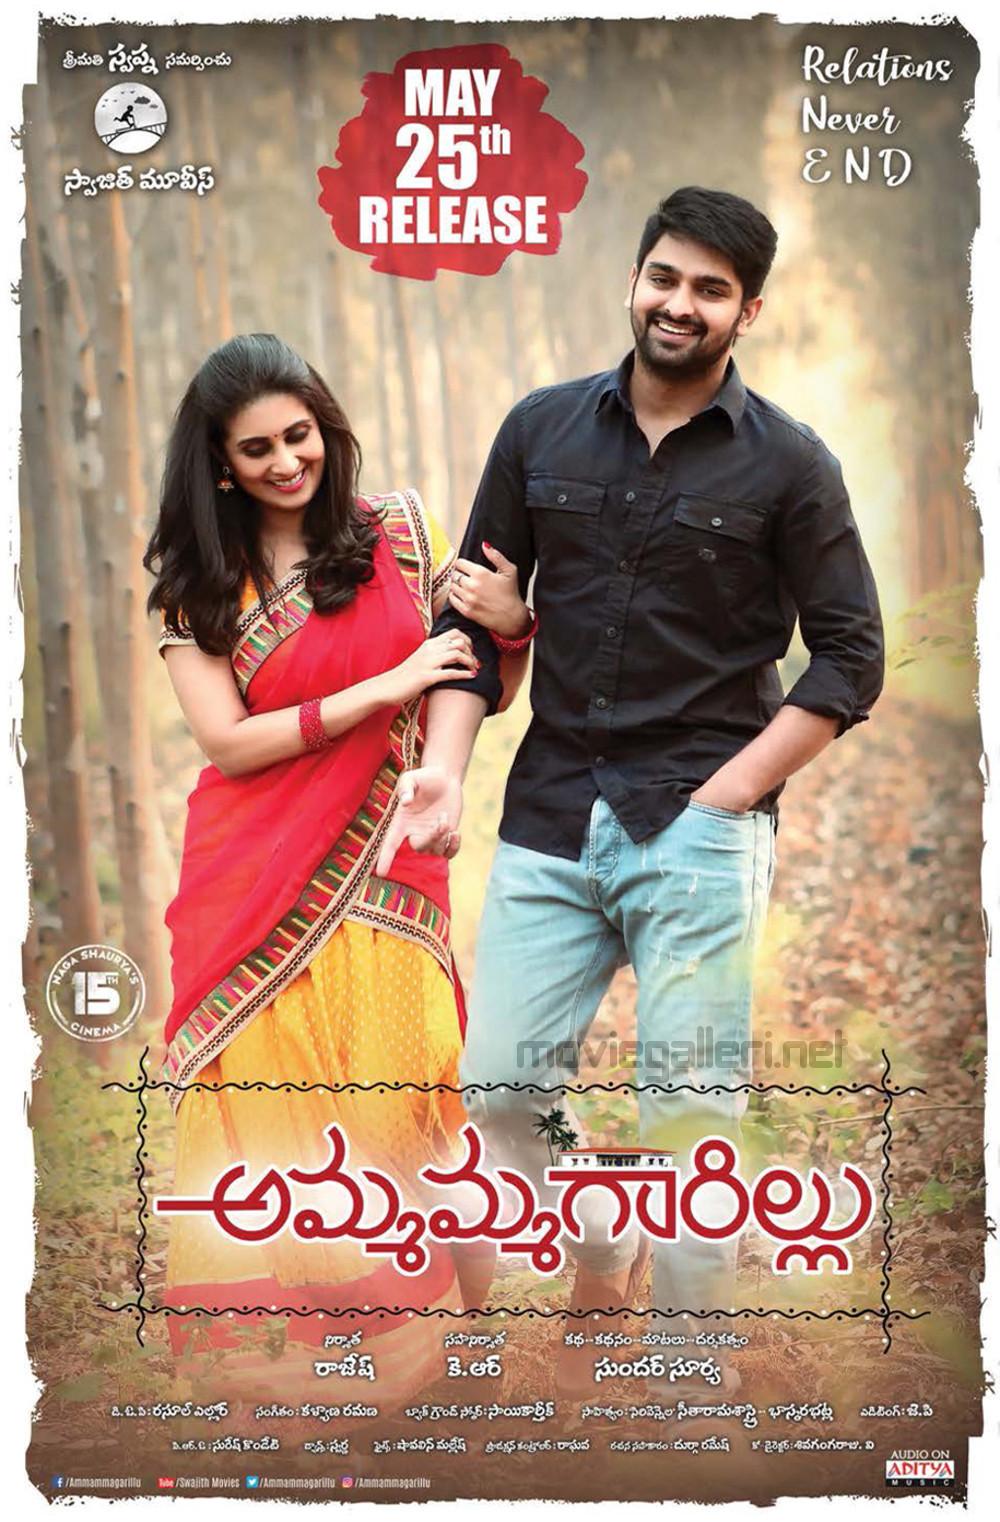 Shamili Naga Shaurya Ammamma Gari Illu Movie Release Date May 25th Posters